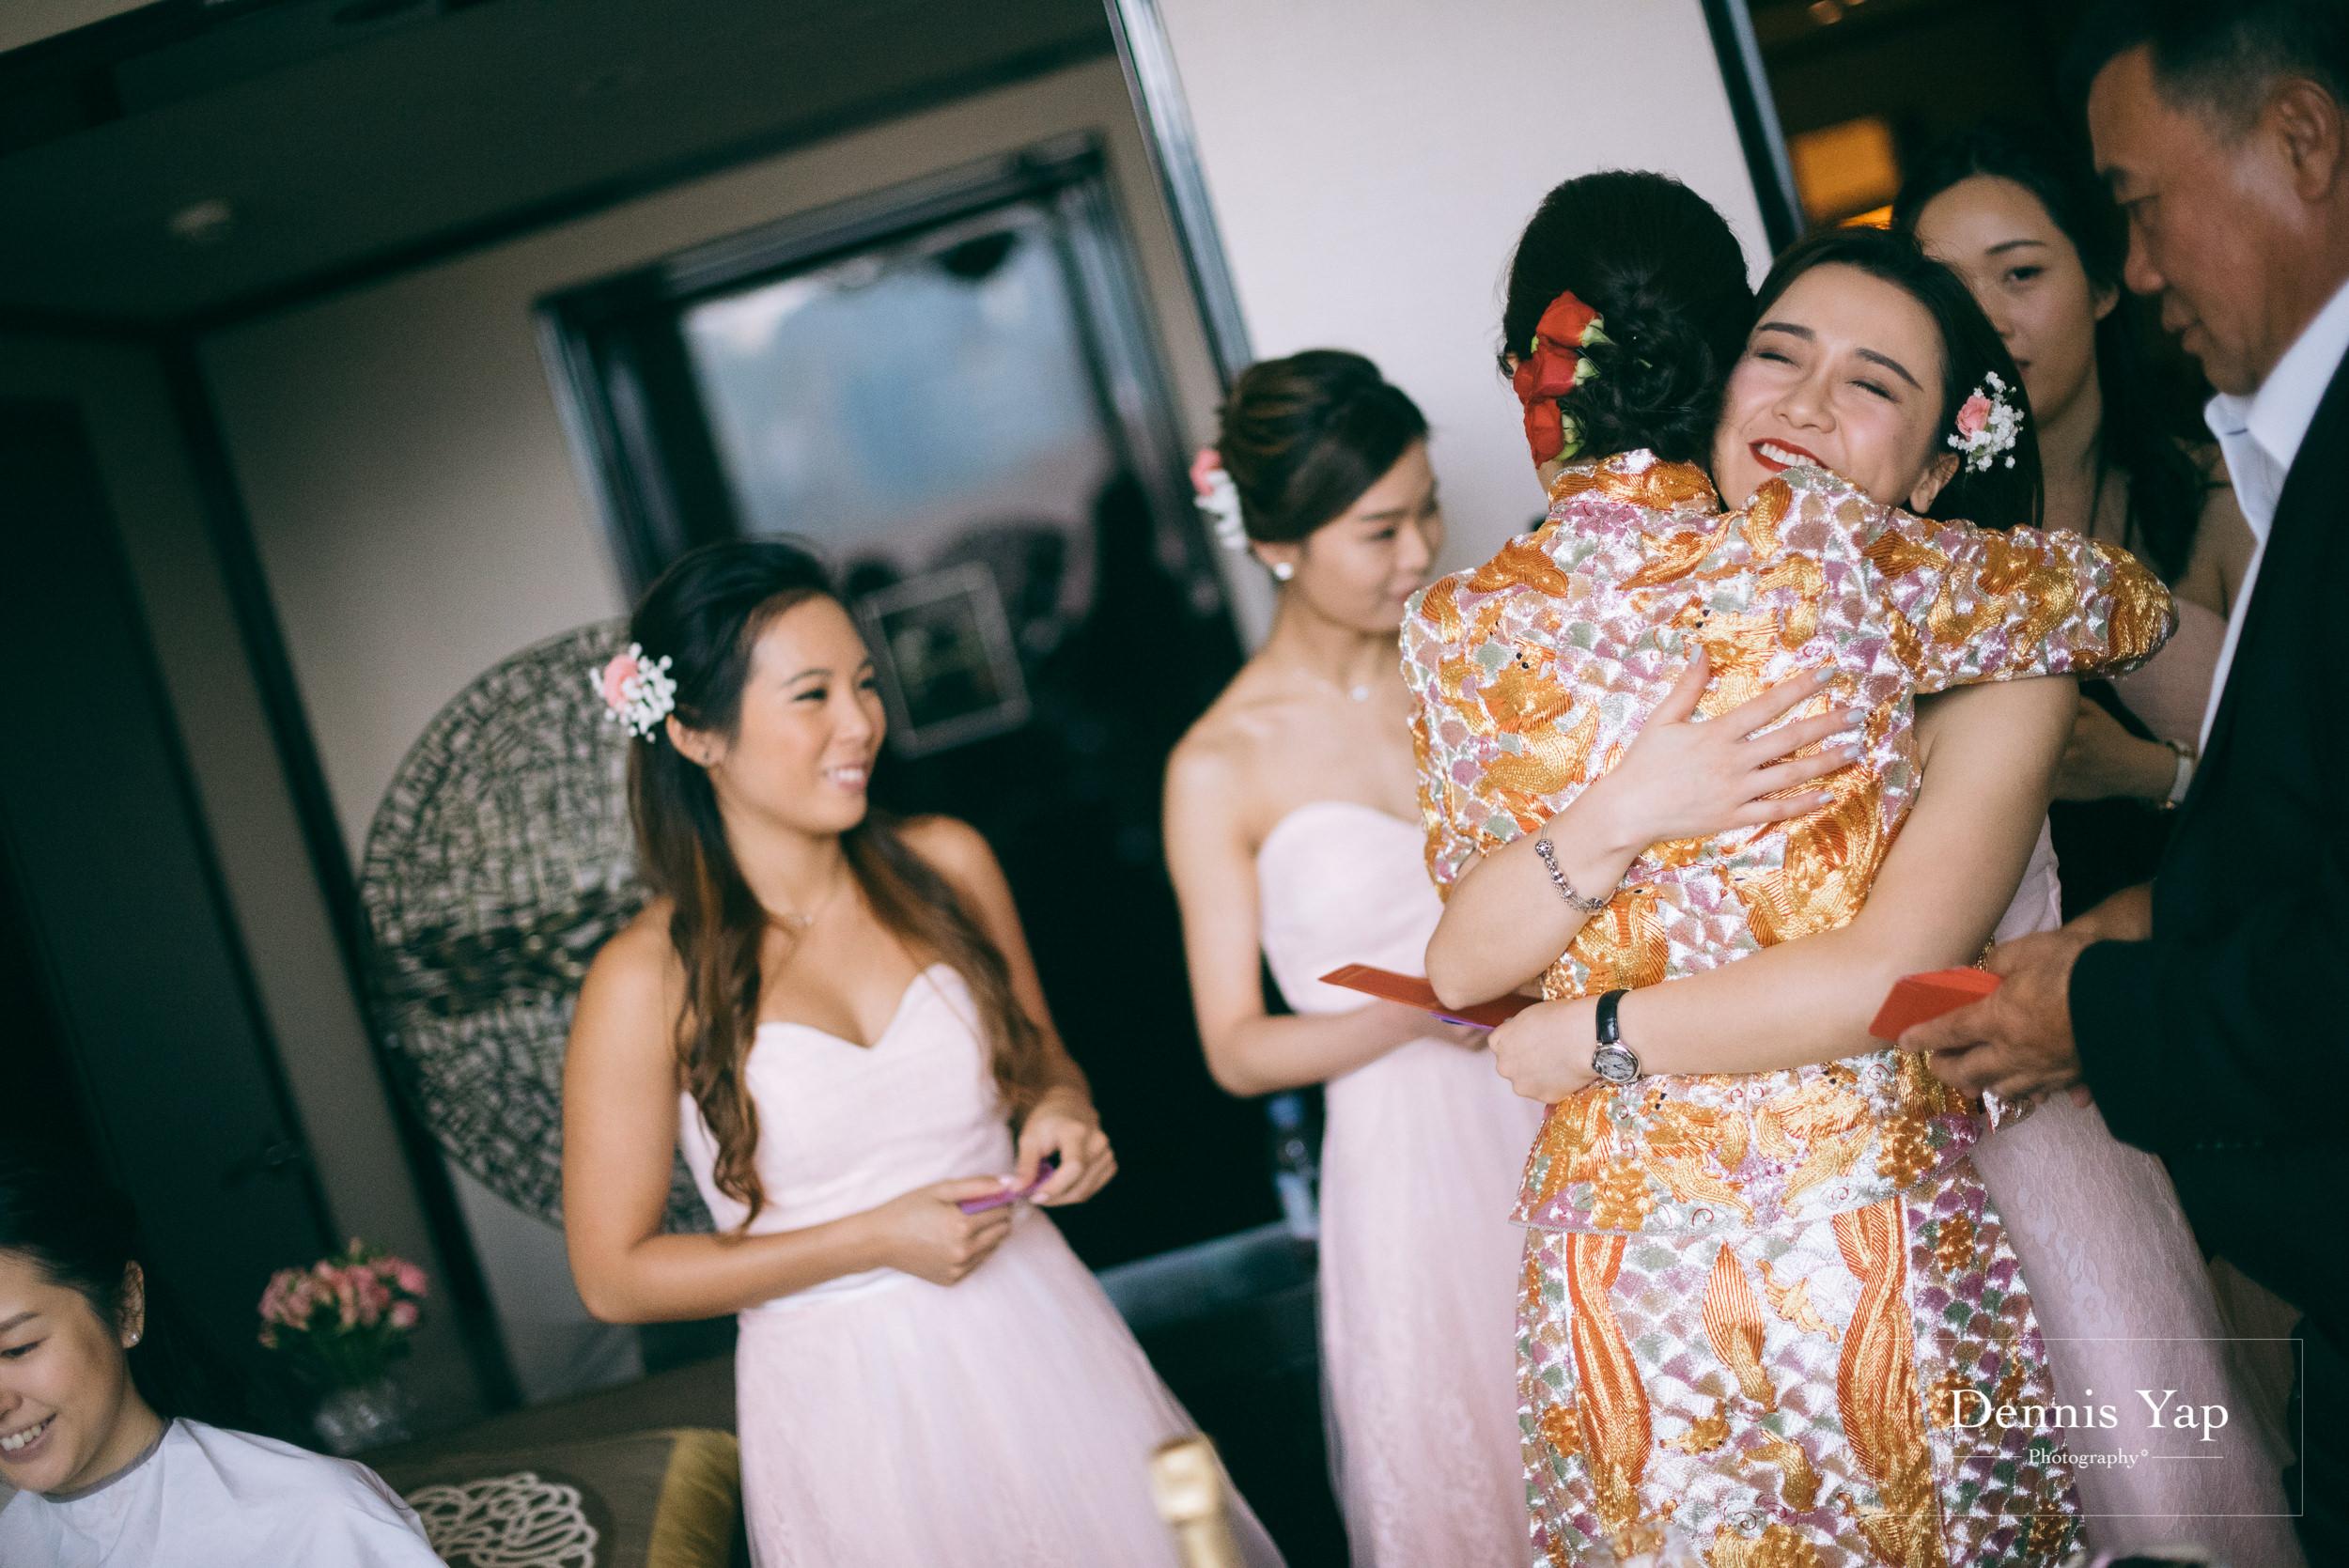 jason crystal wedding day gate crash hong kong garden wedding dennis yap photography-5.jpg